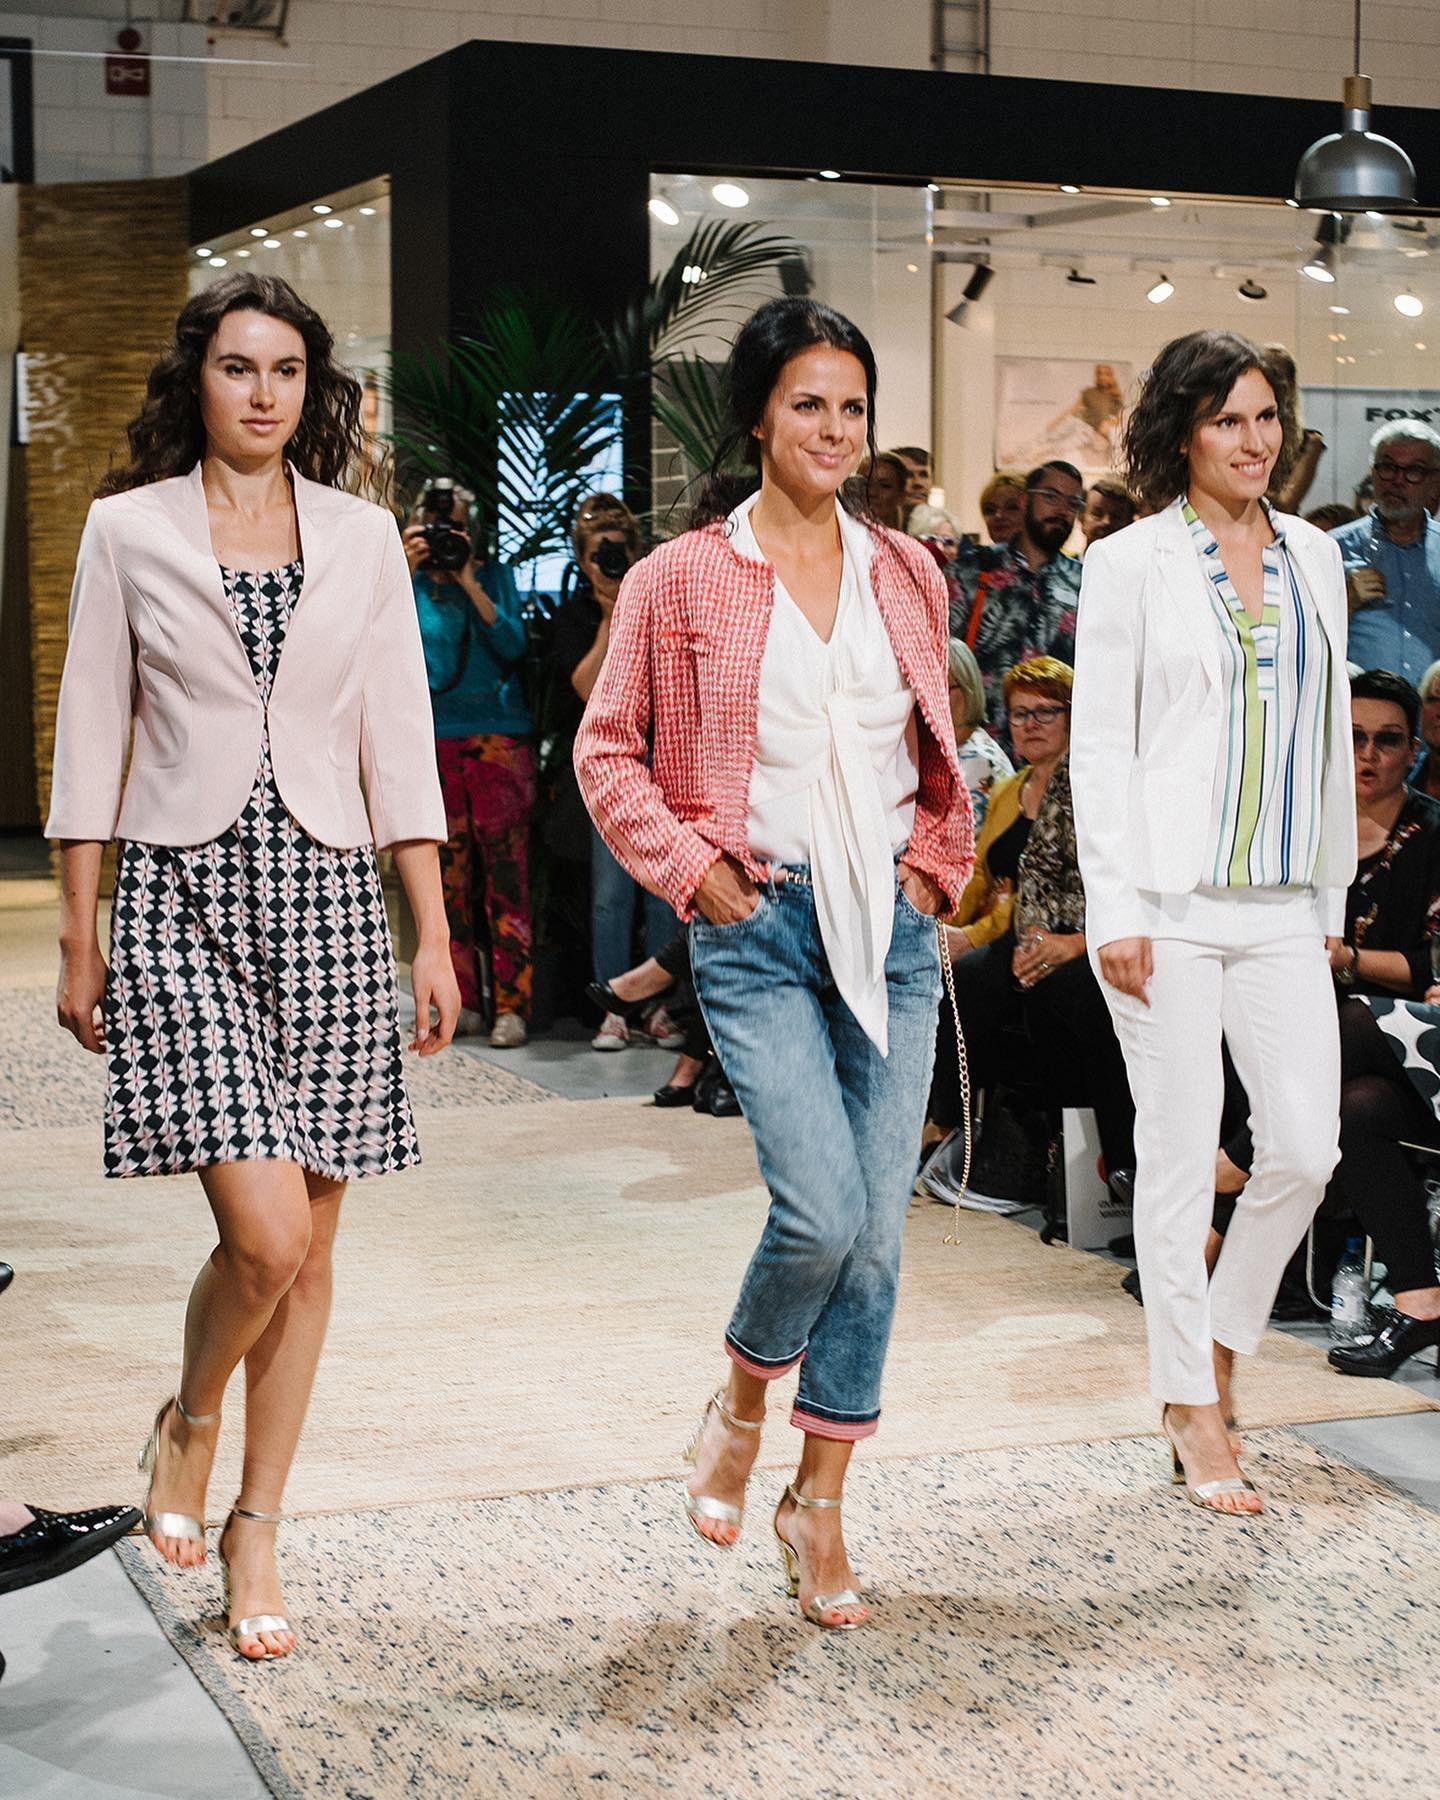 Fashion Center 2020